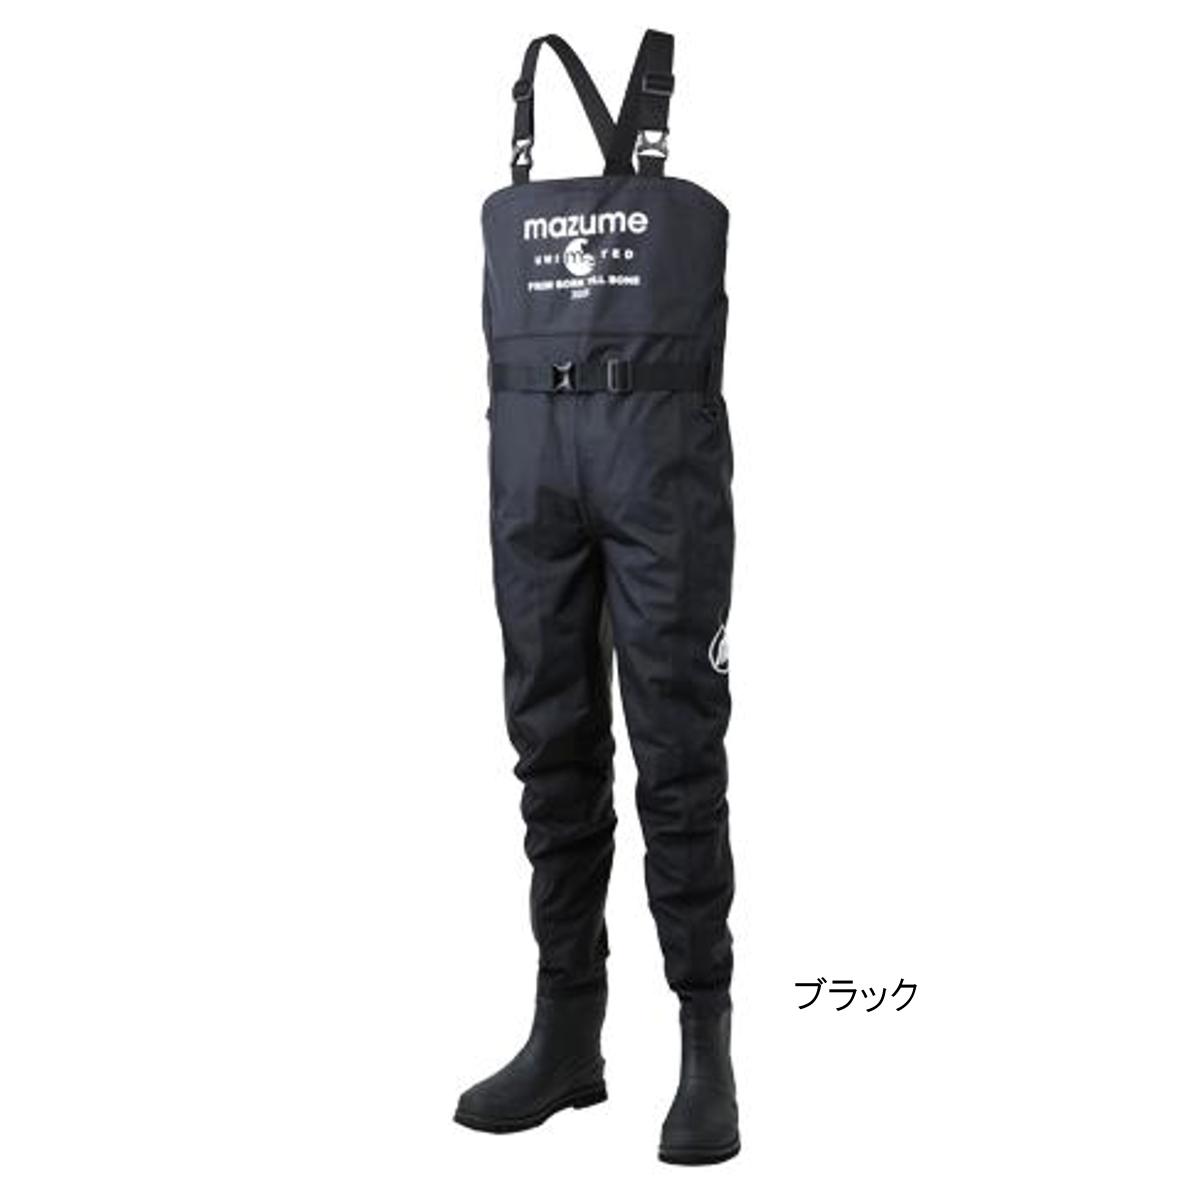 mazume ゲームウェイダー Ver.2 MZBF-406 LL ブラック